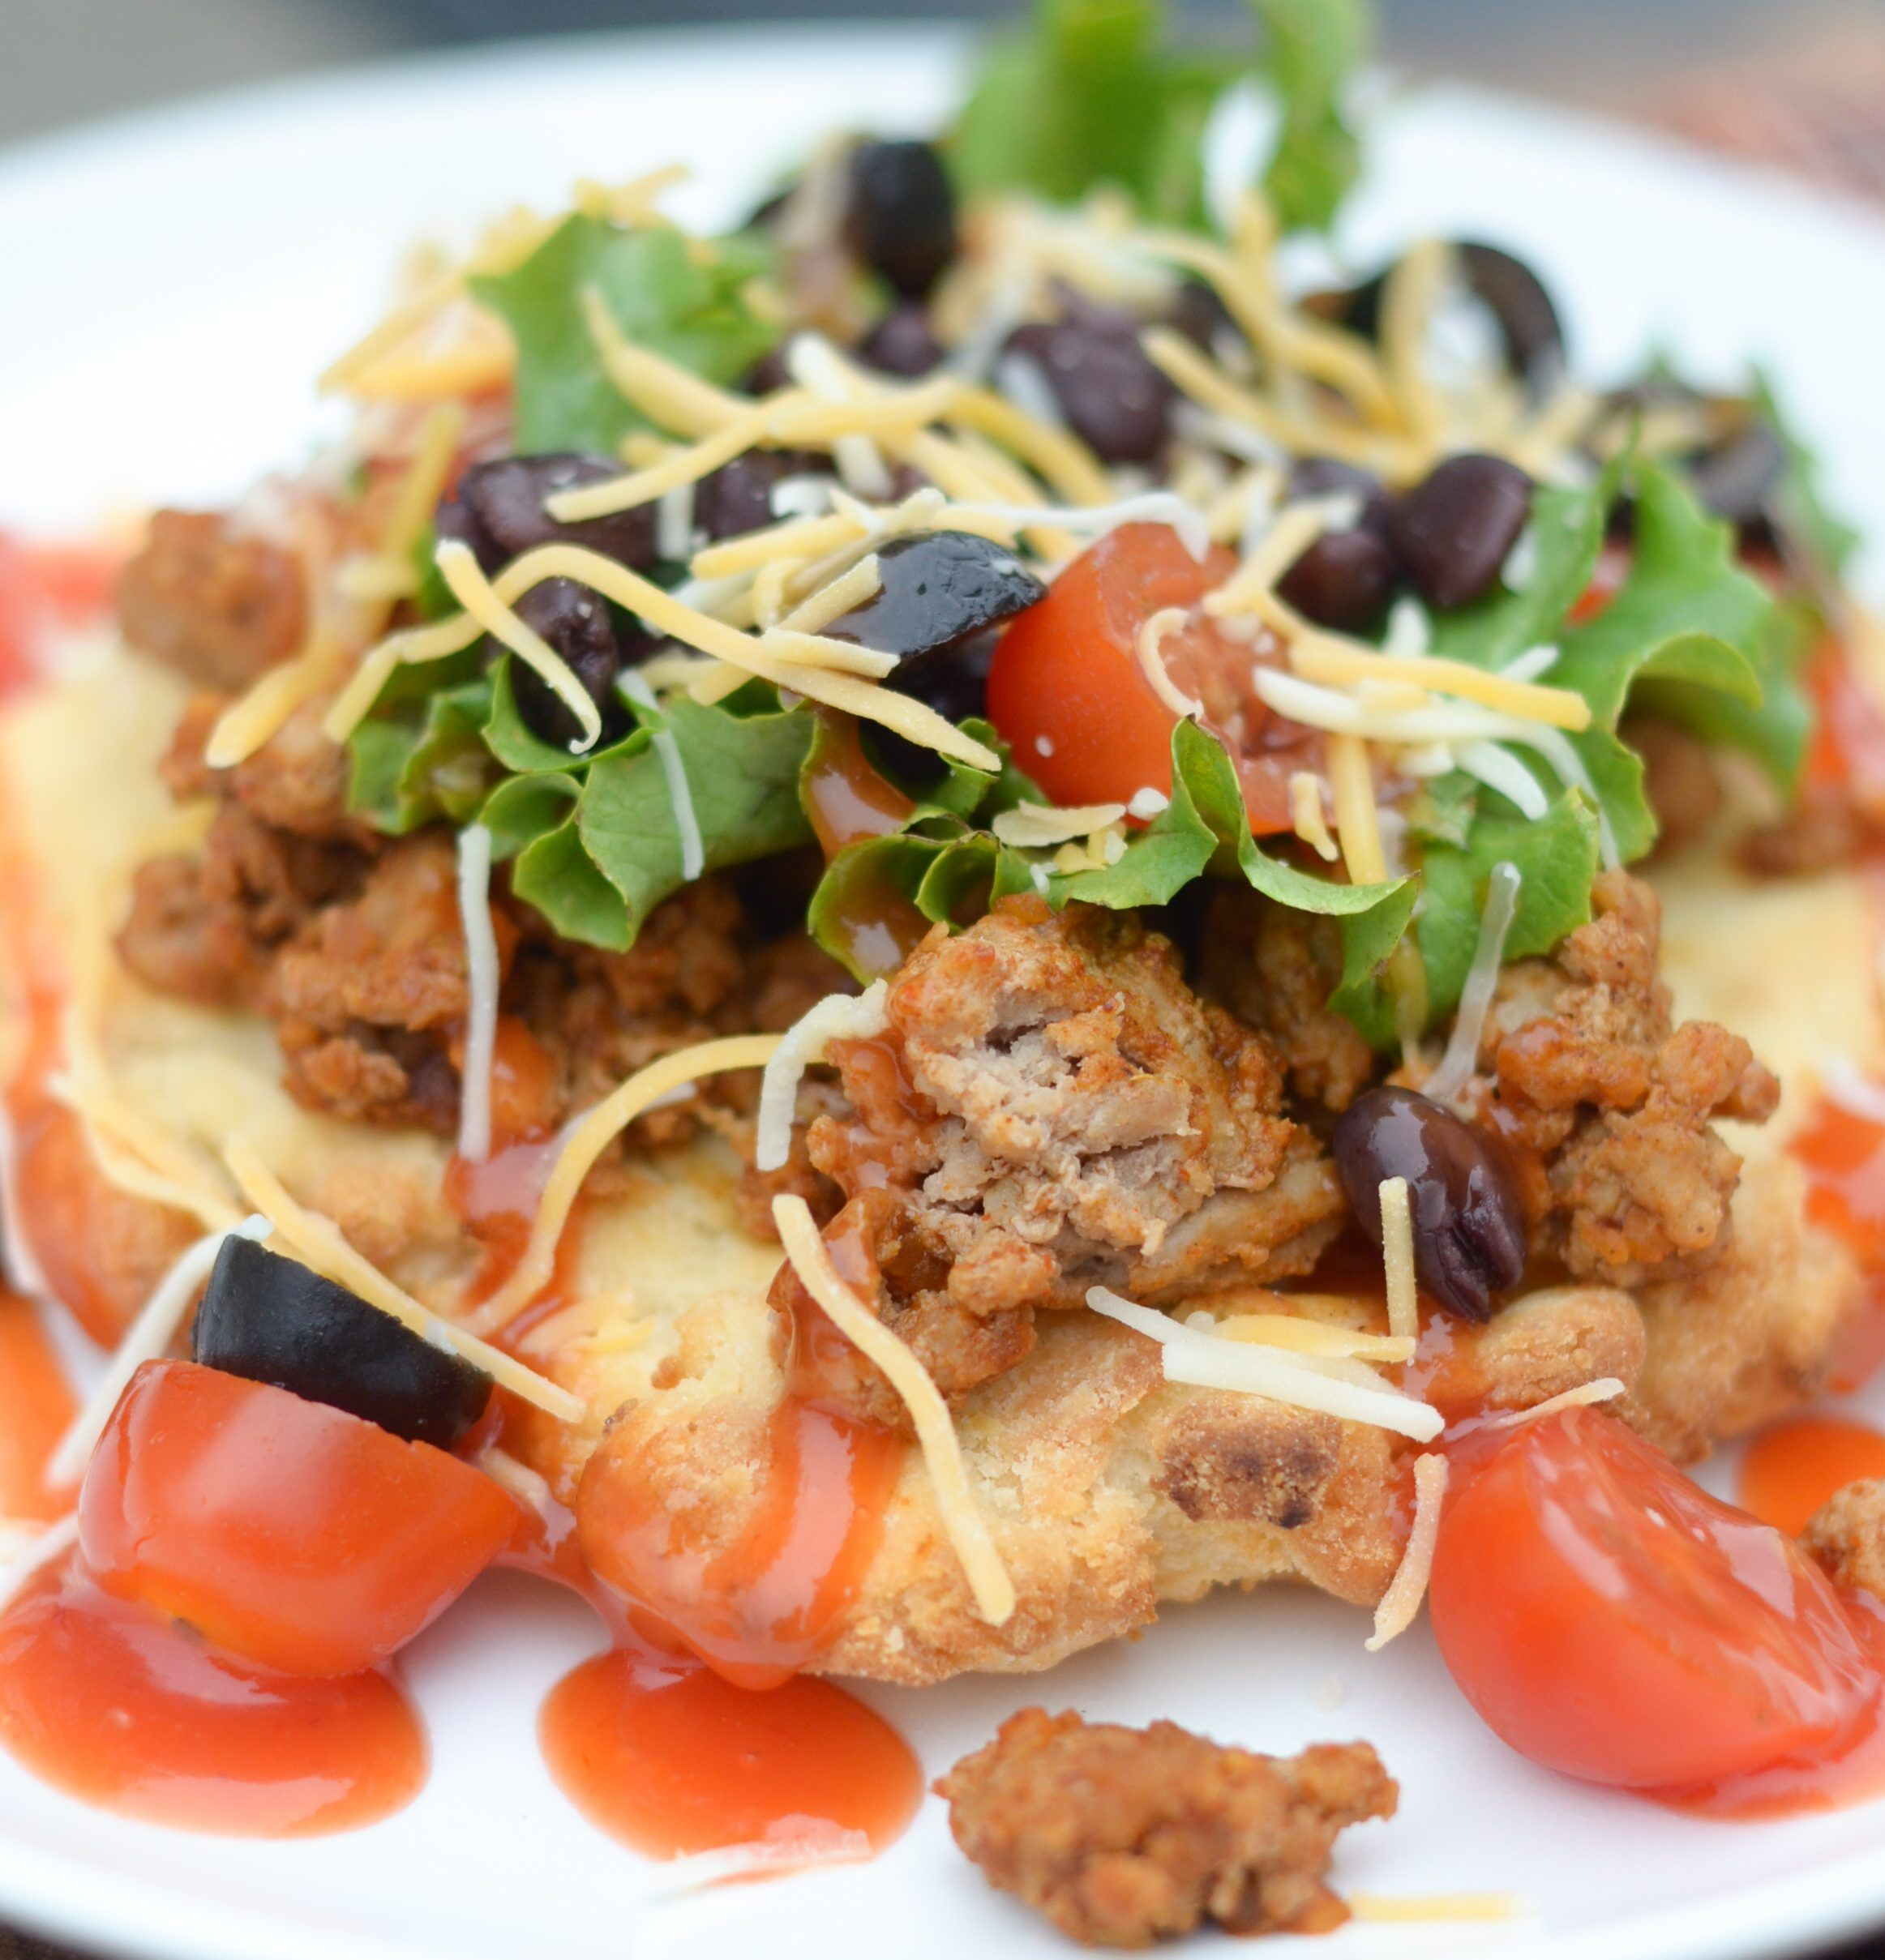 Gluten free air fryer indian tacos recipe indian tacos